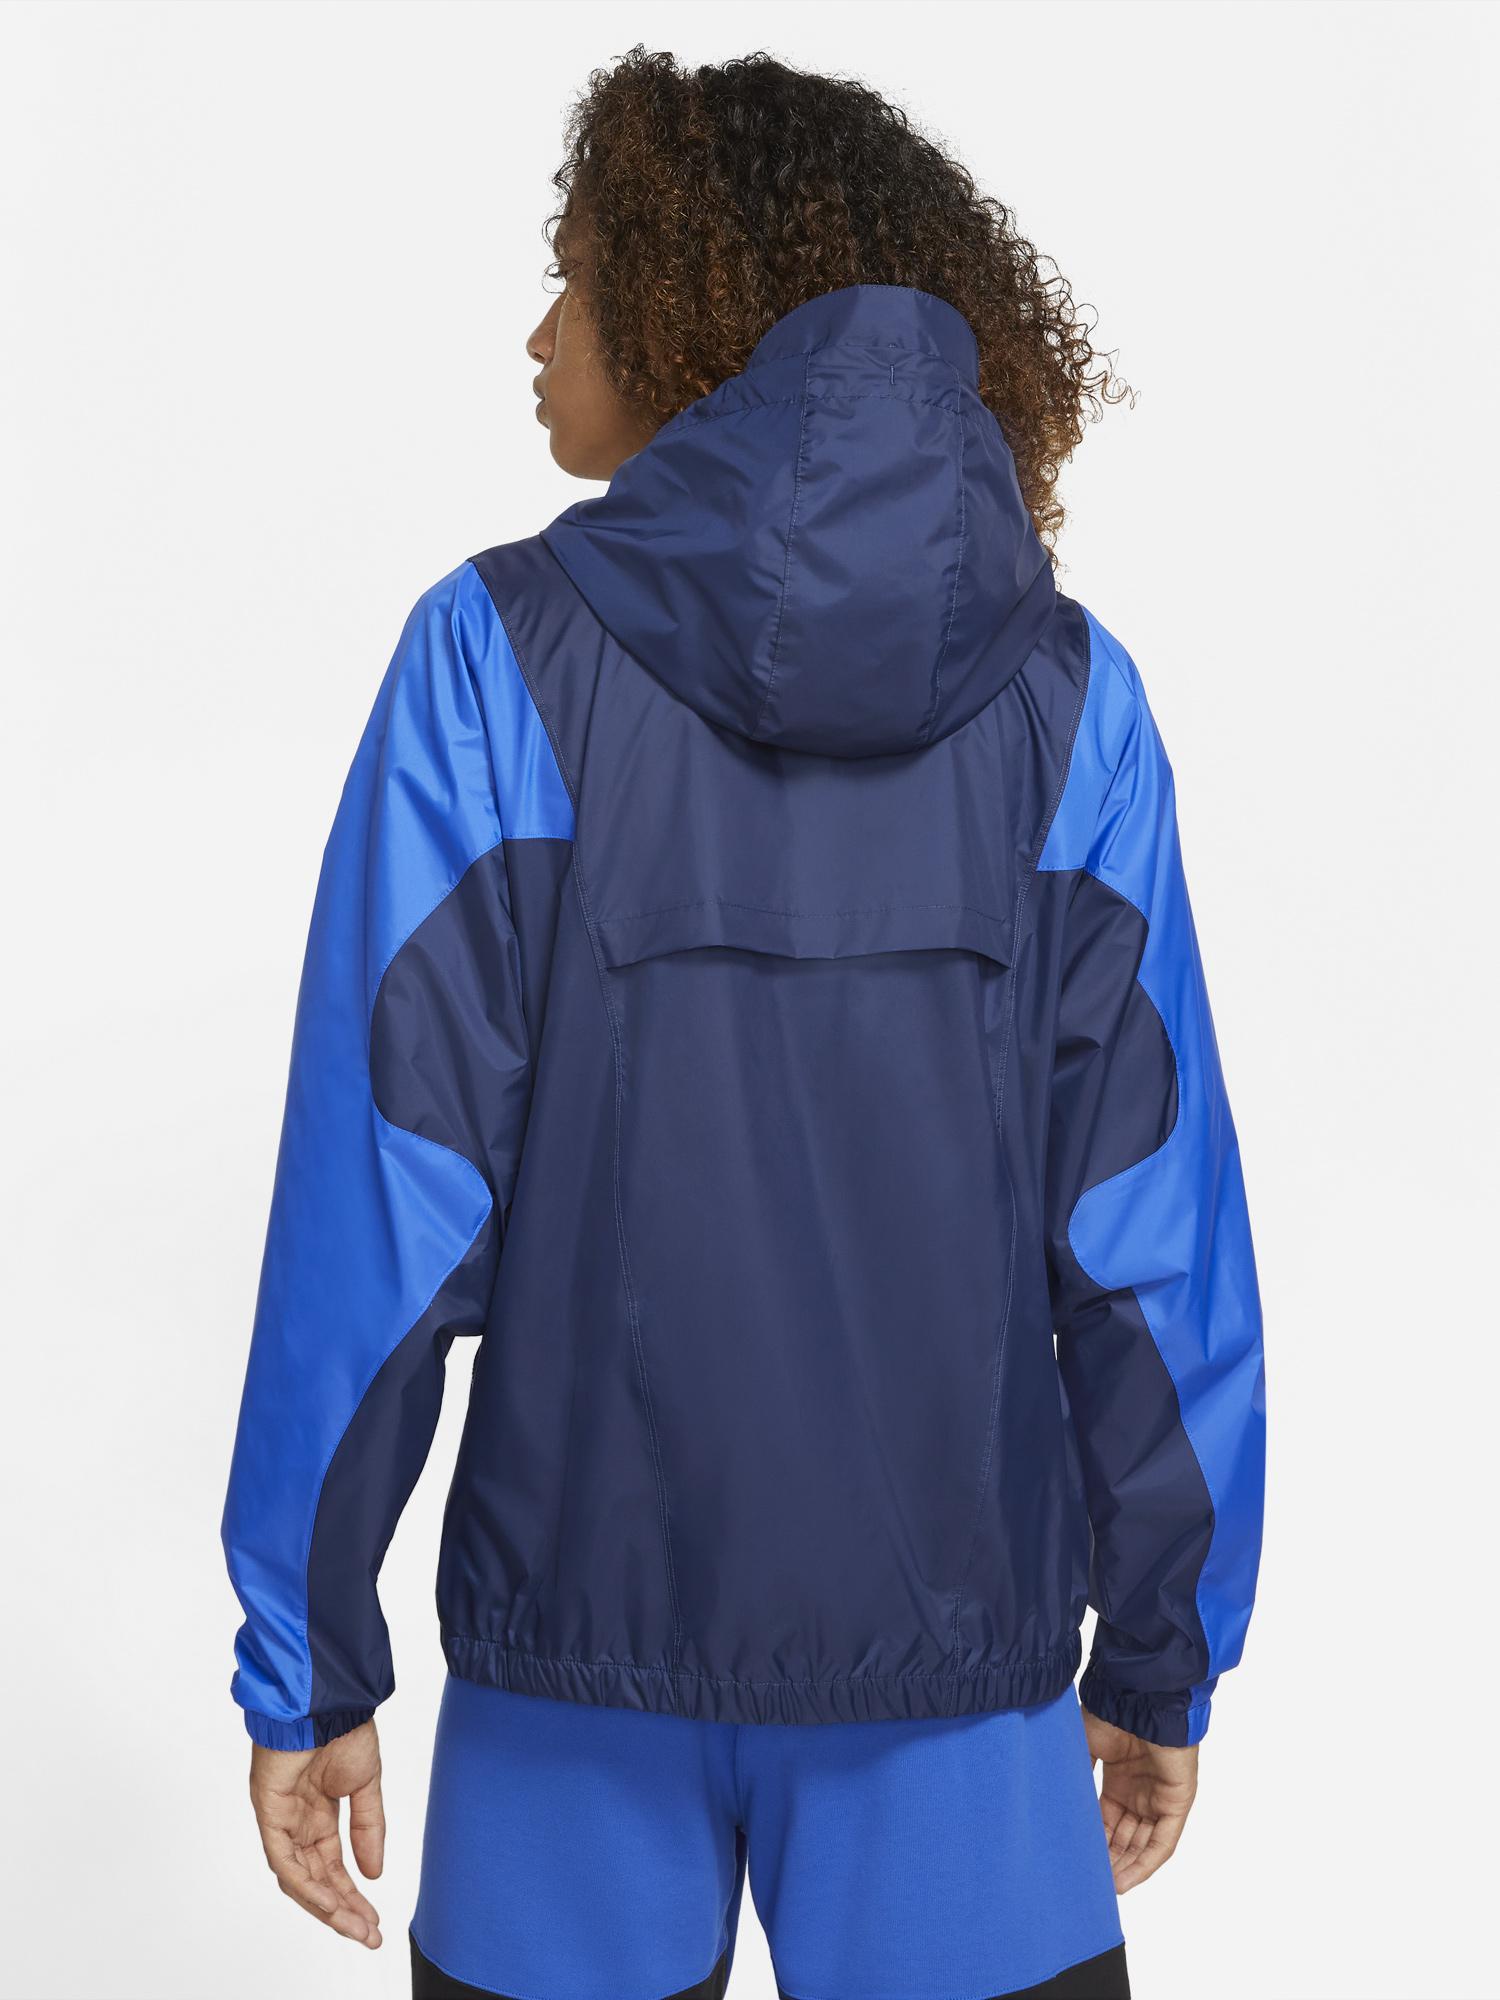 jordan-essential-woven-jacket-hyper-royal-midnight-navy-2